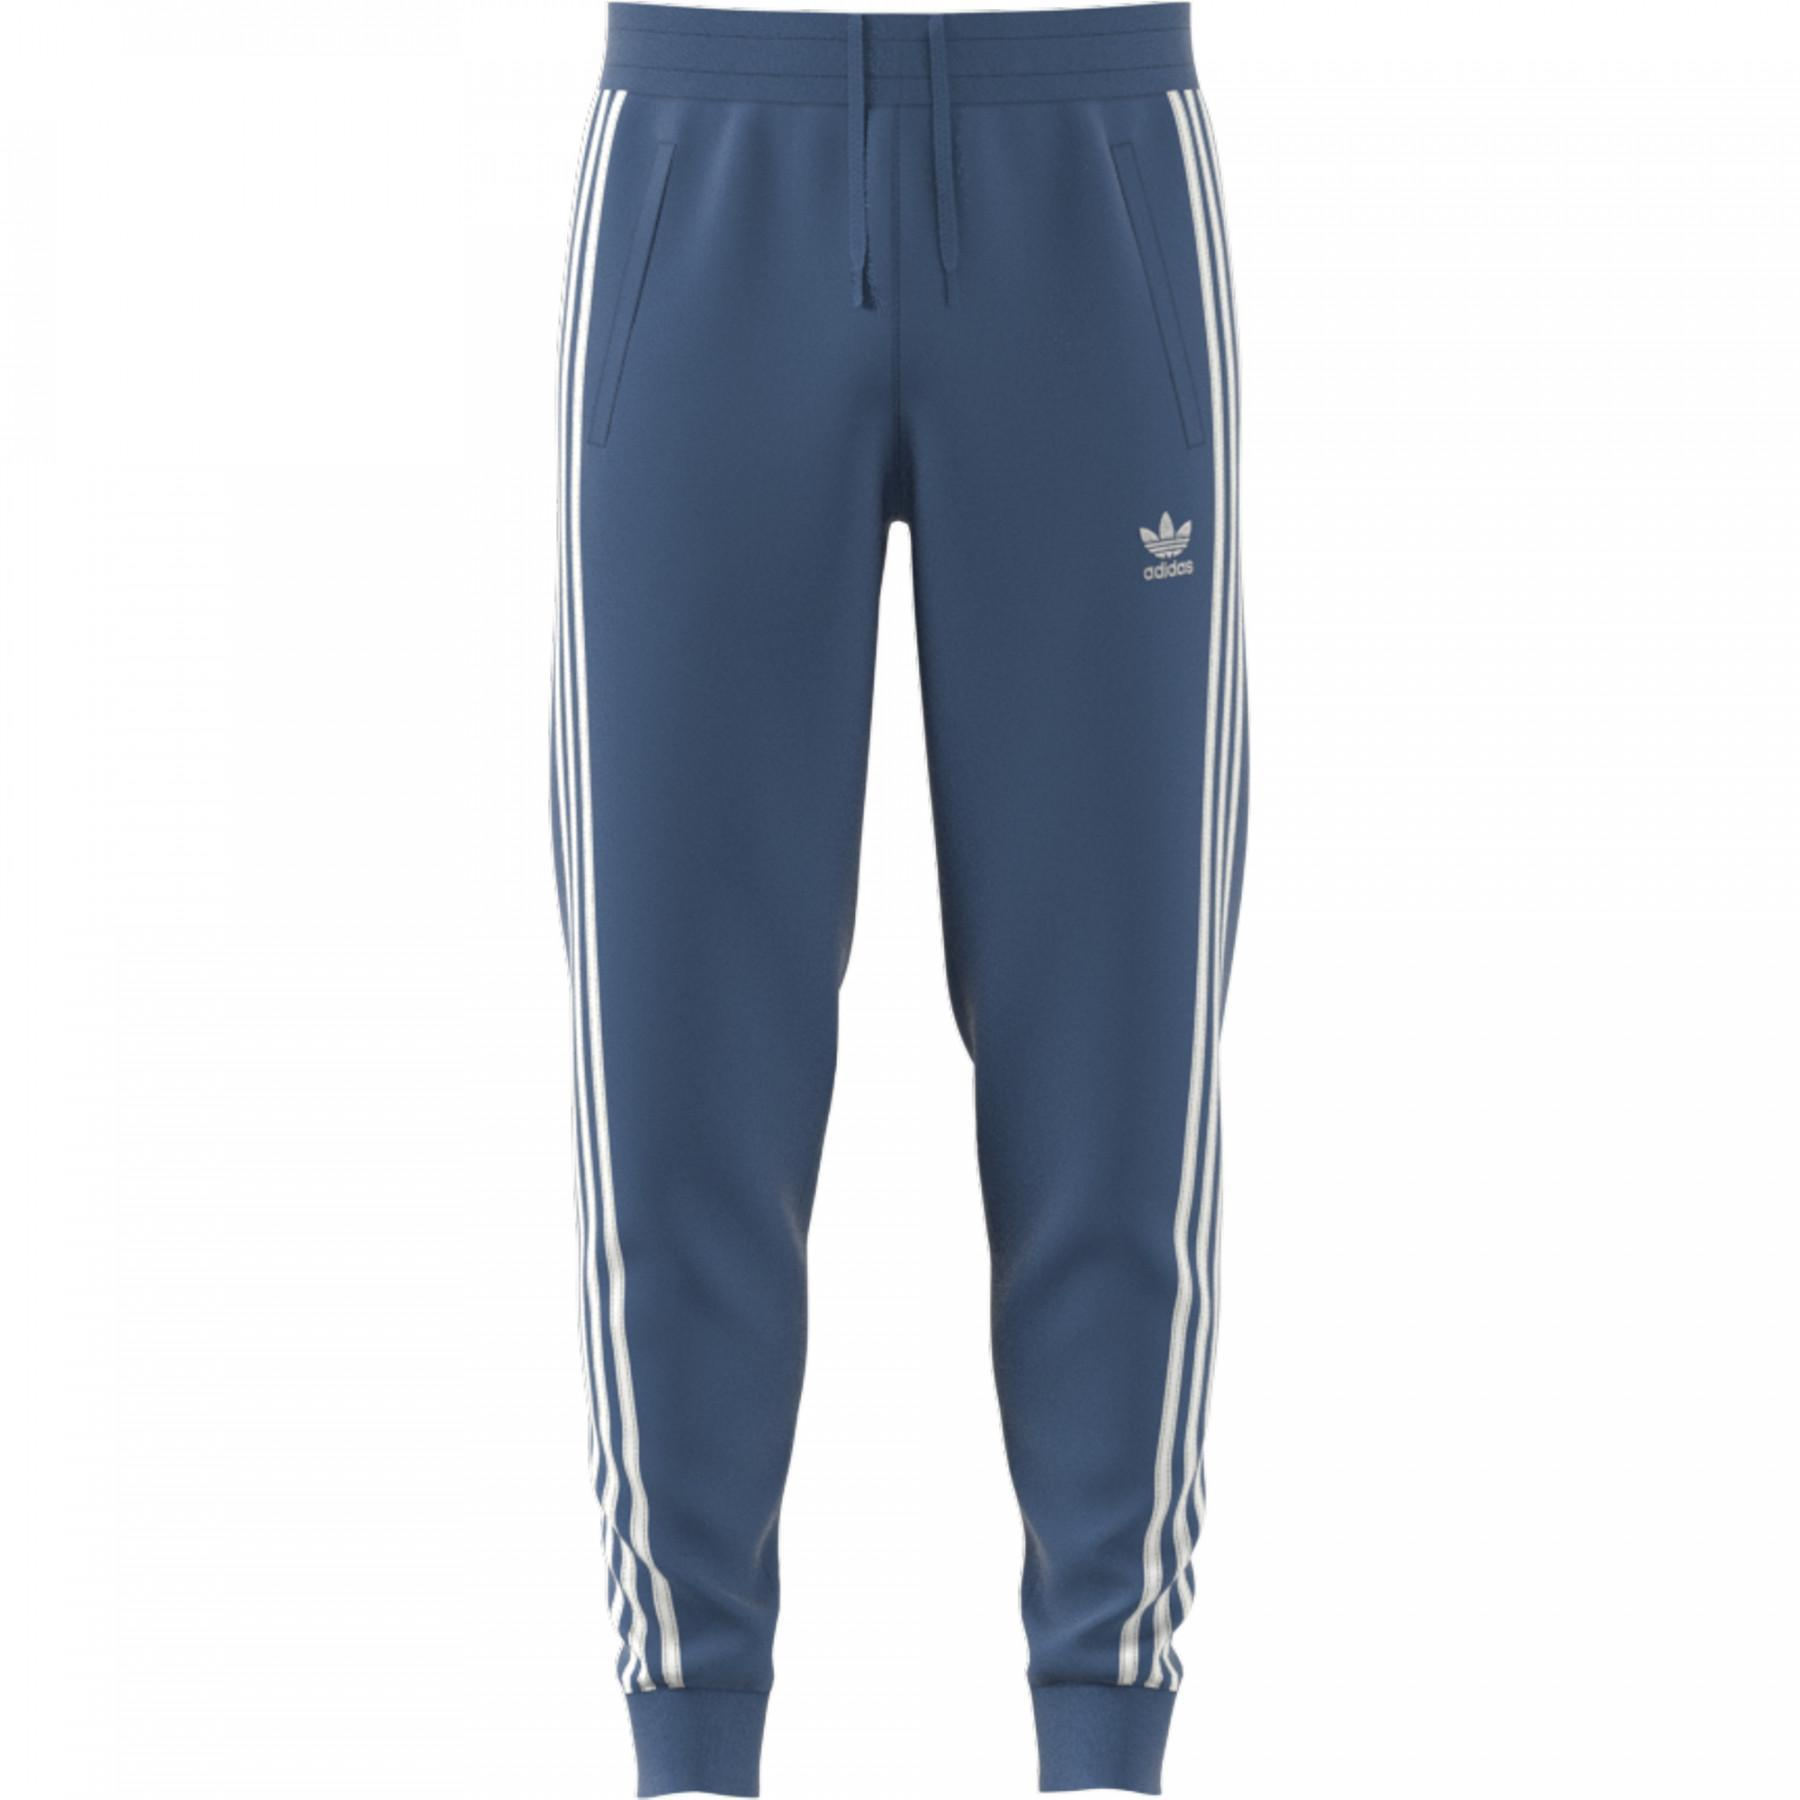 Adidas 3-Stripes Track Pants